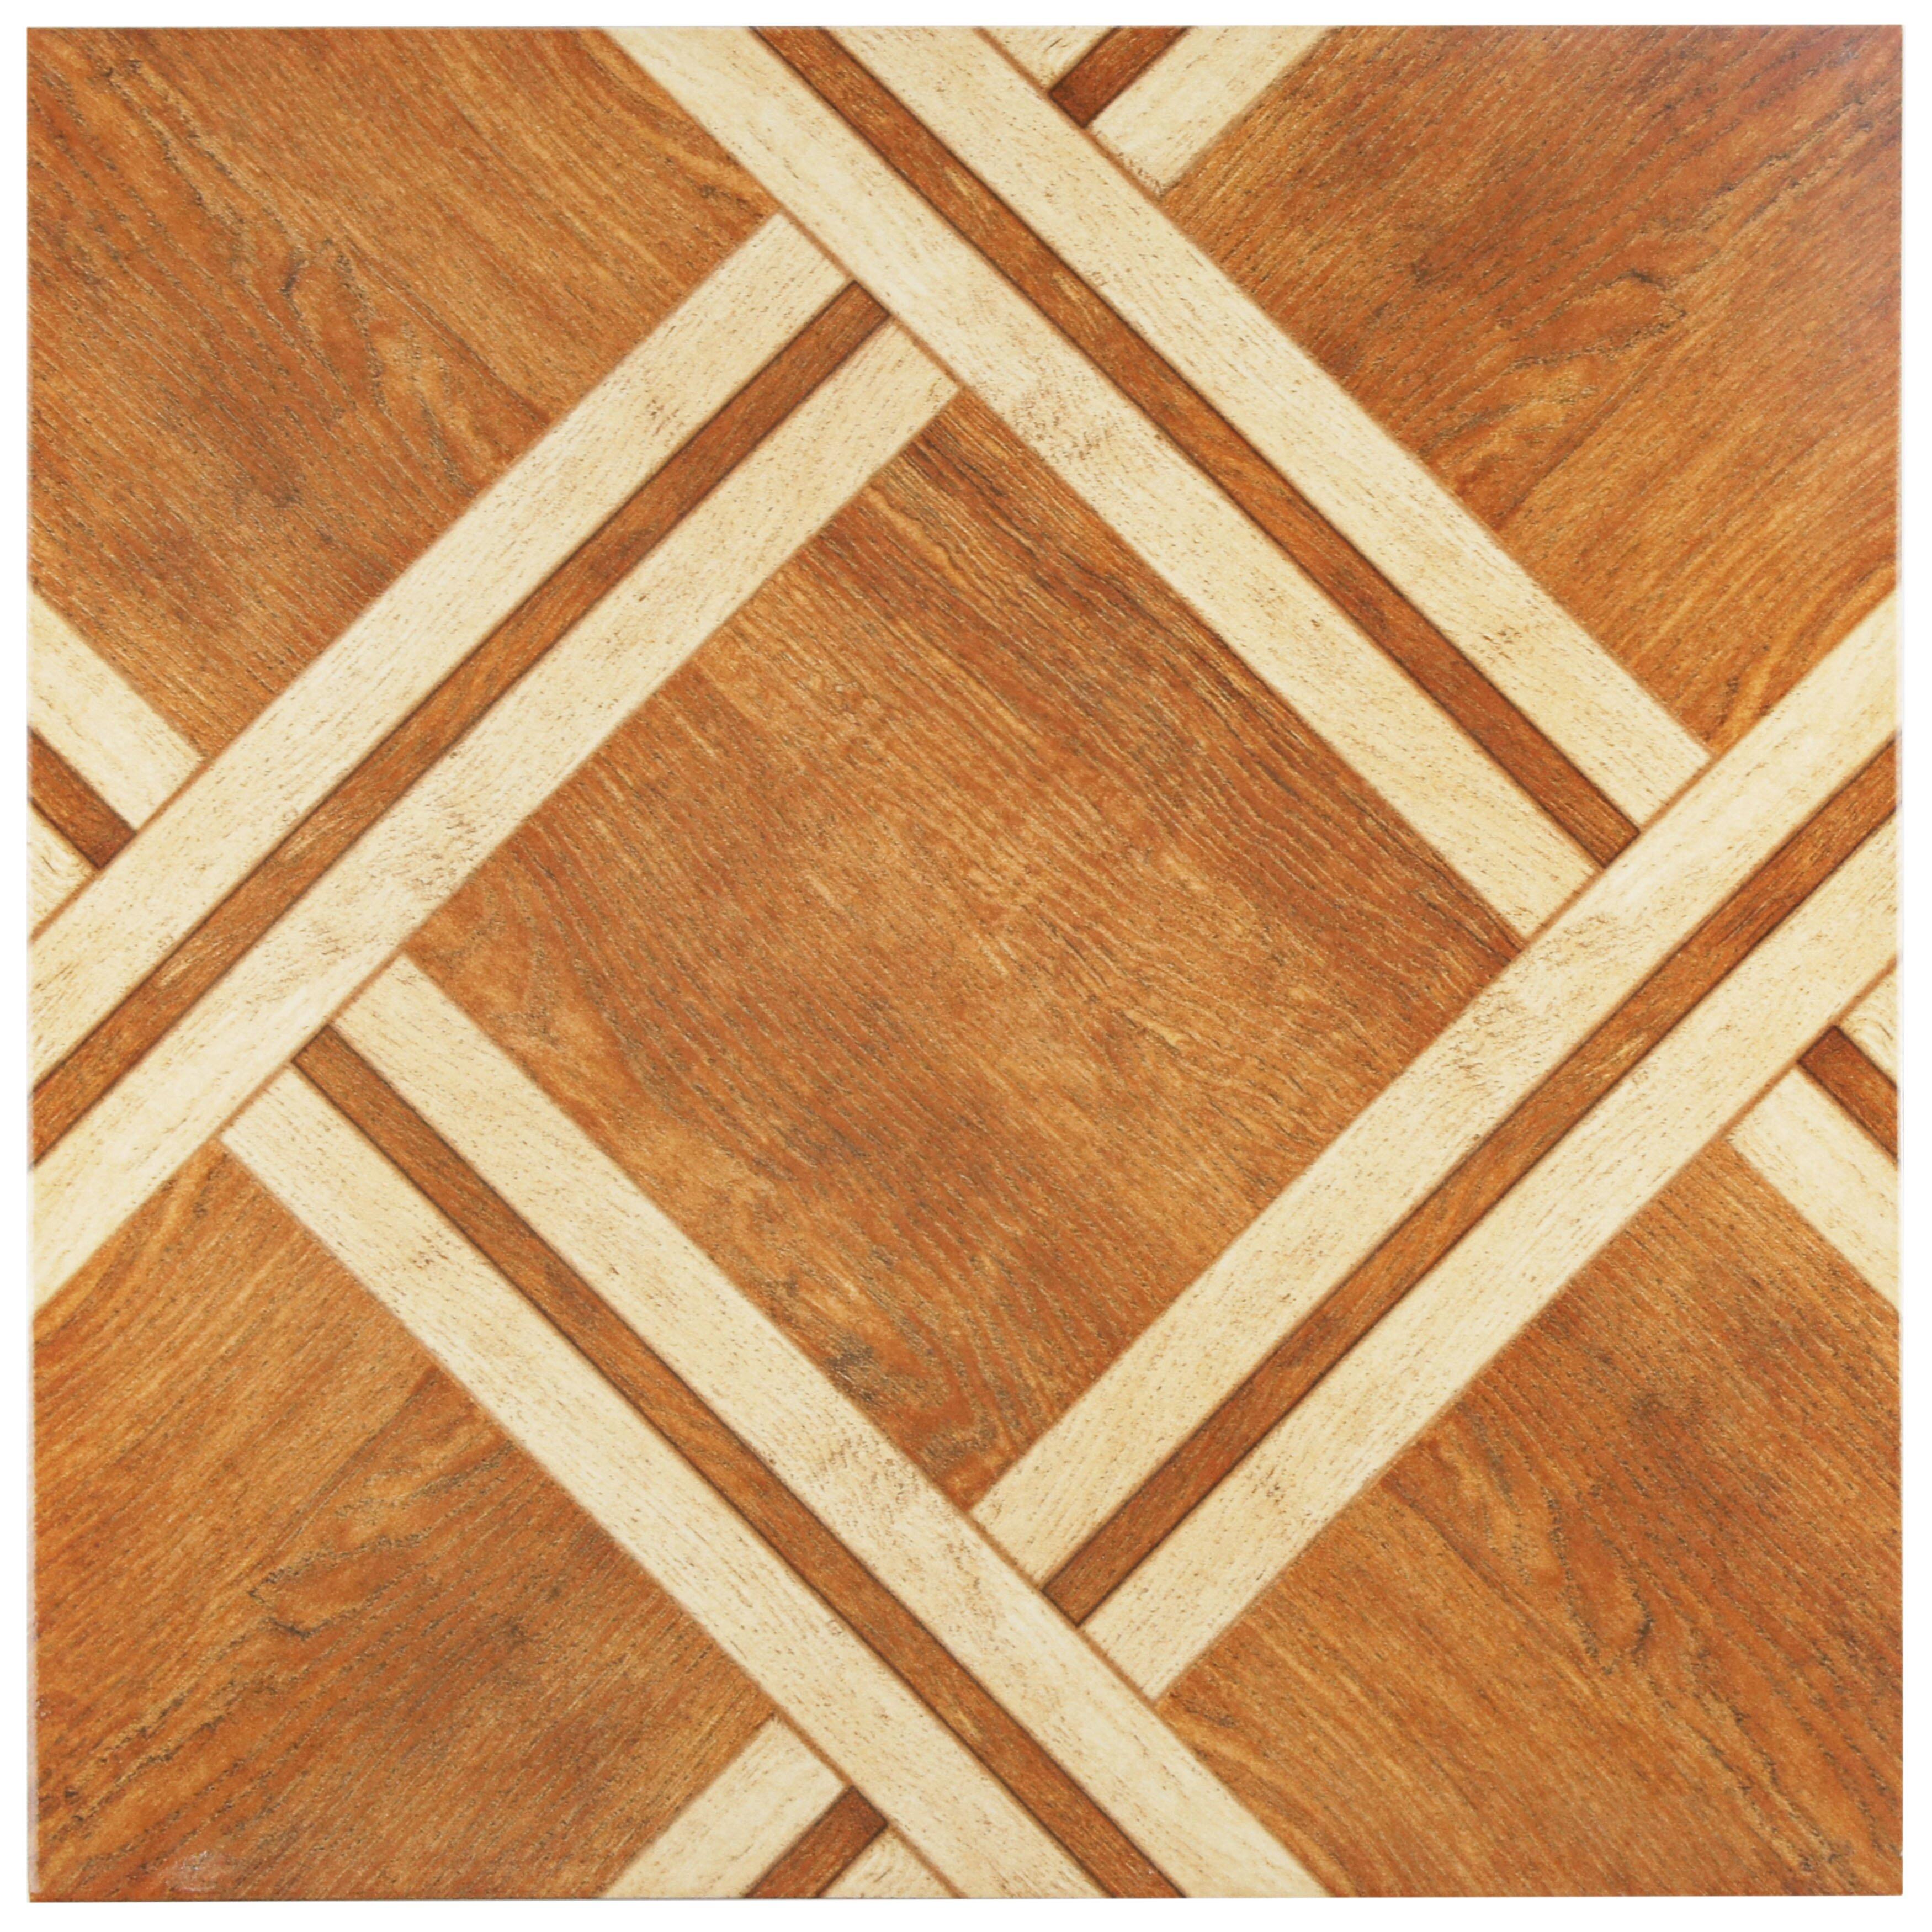 Elitetile anchorage x ceramic wood look tile for 17 floor